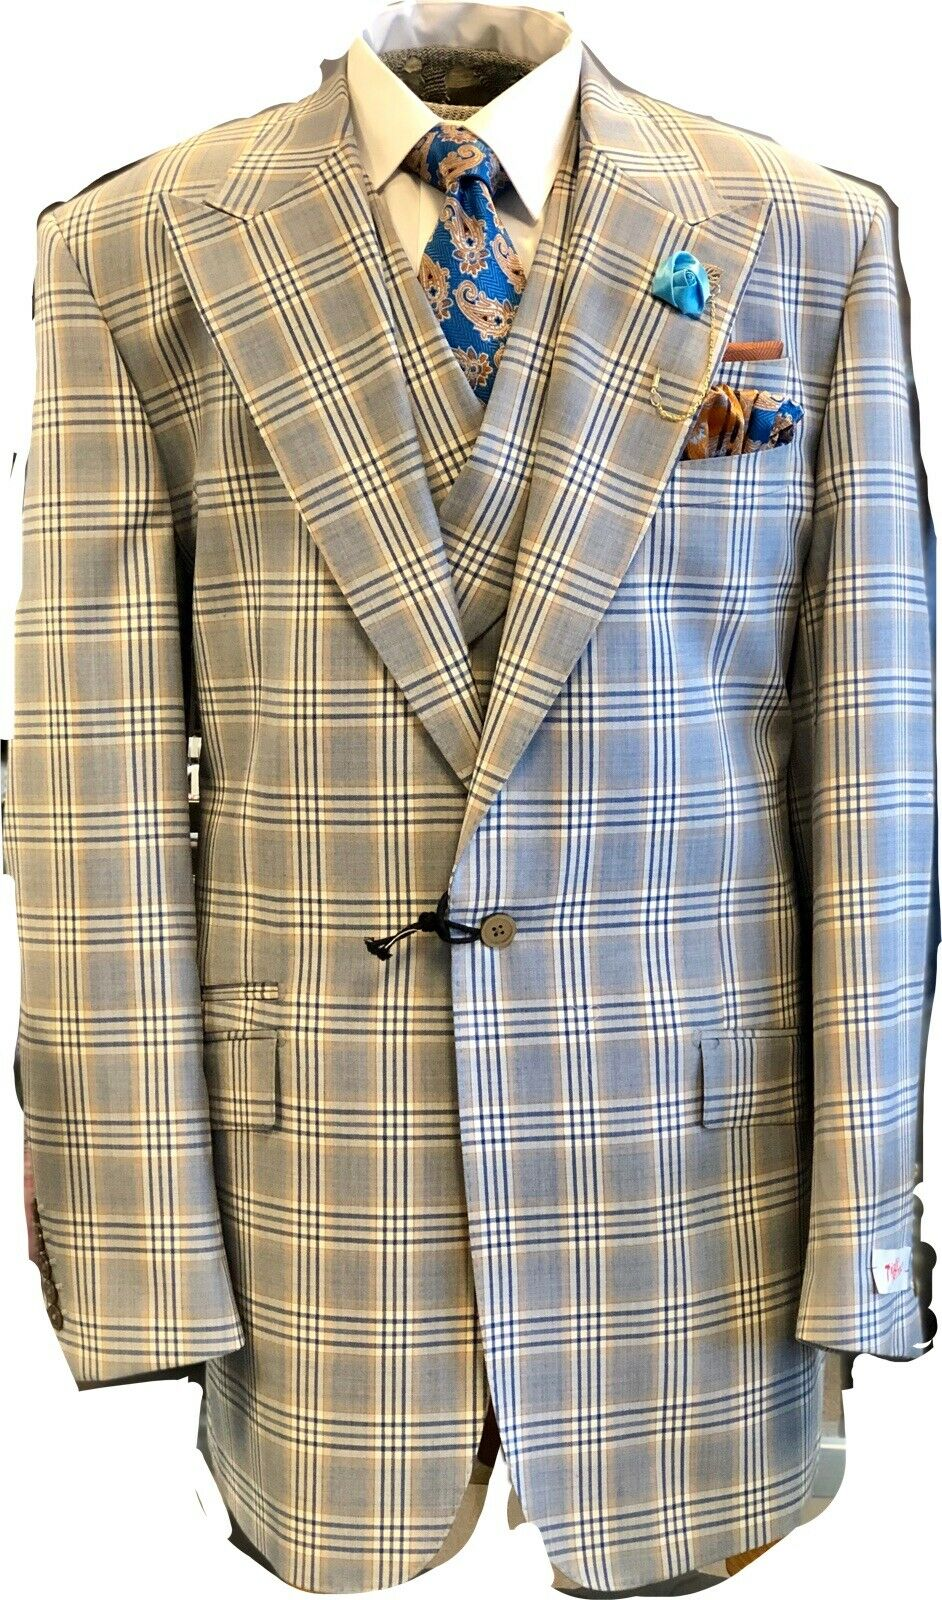 NEW Tiglio rot Blau W  Orange Plaid 3pc Italian Suit 48 Long Msrp  499